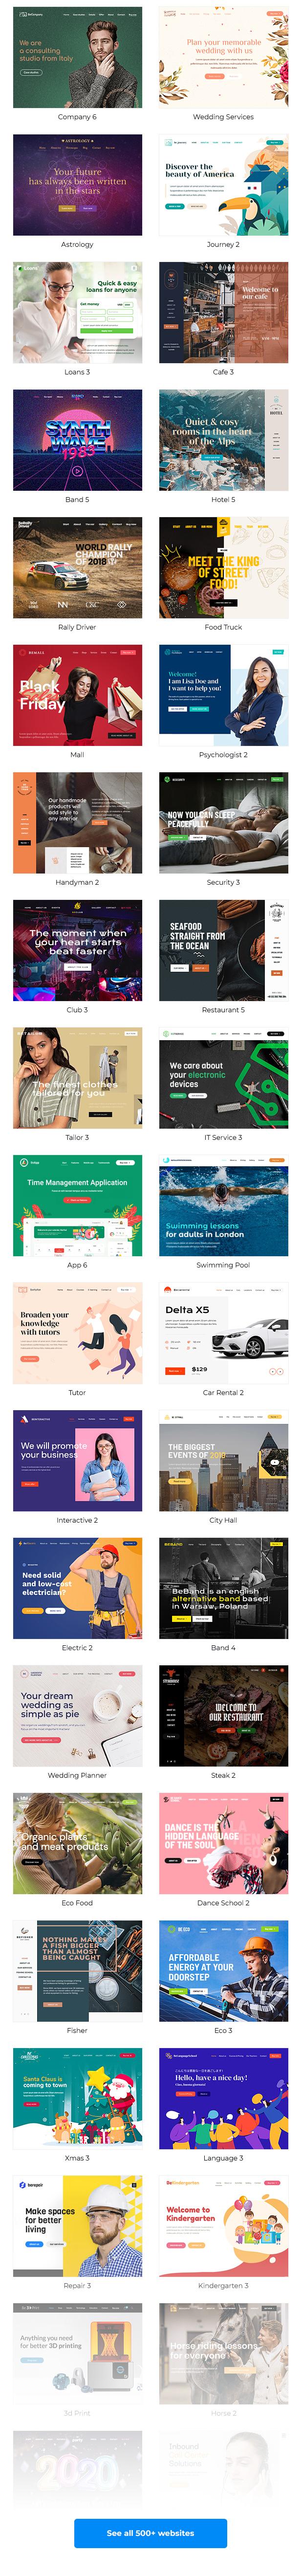 layouts 2176 bottom - BeTheme - Responsive Multi-Purpose WordPress Theme